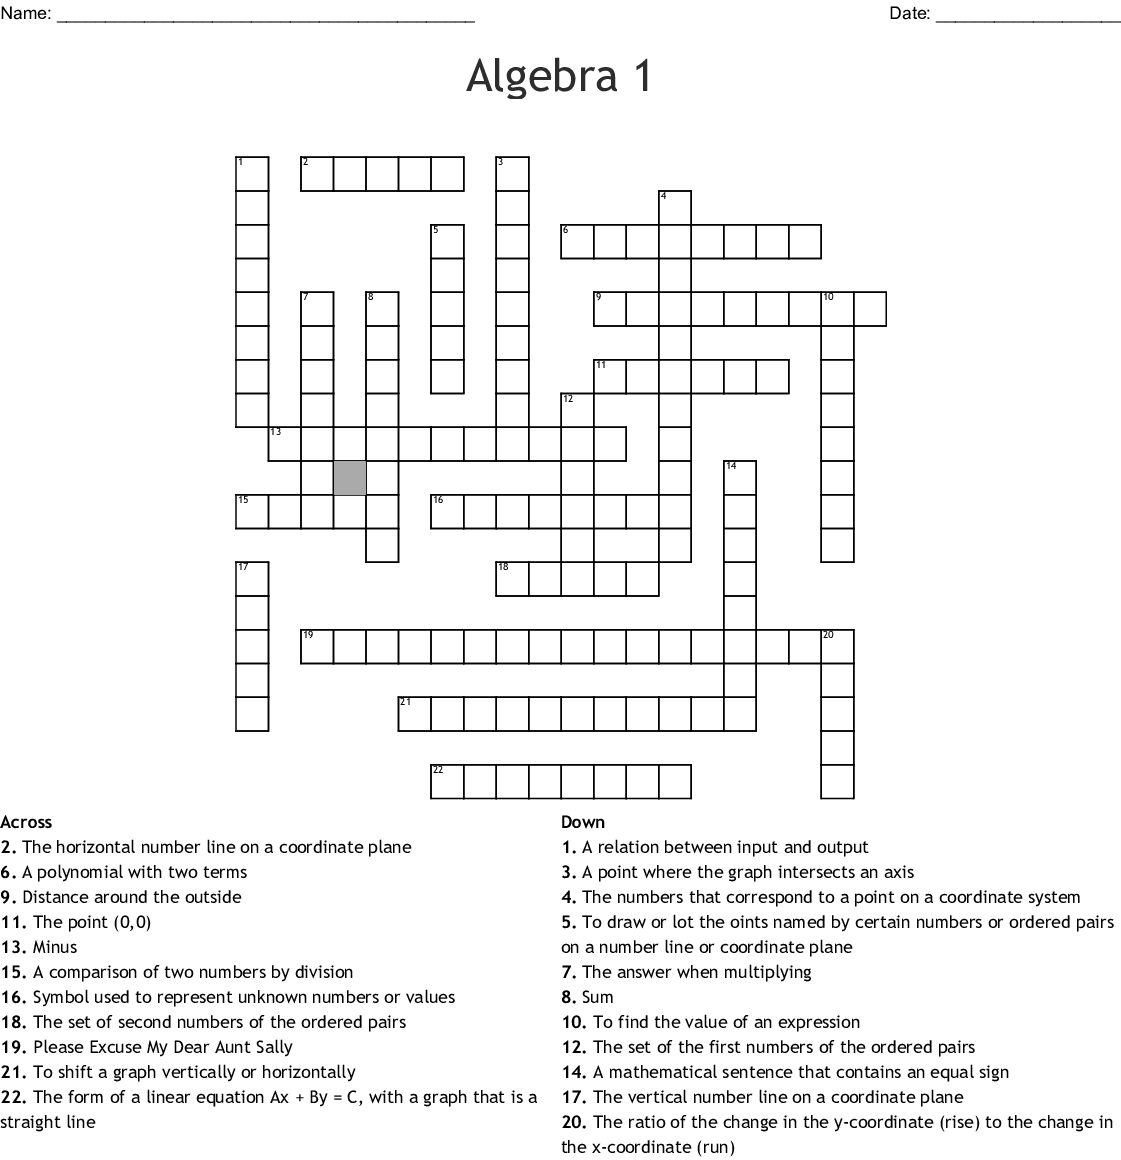 Algebra 1 Crossword - Wordmint - Printable Crossword #1